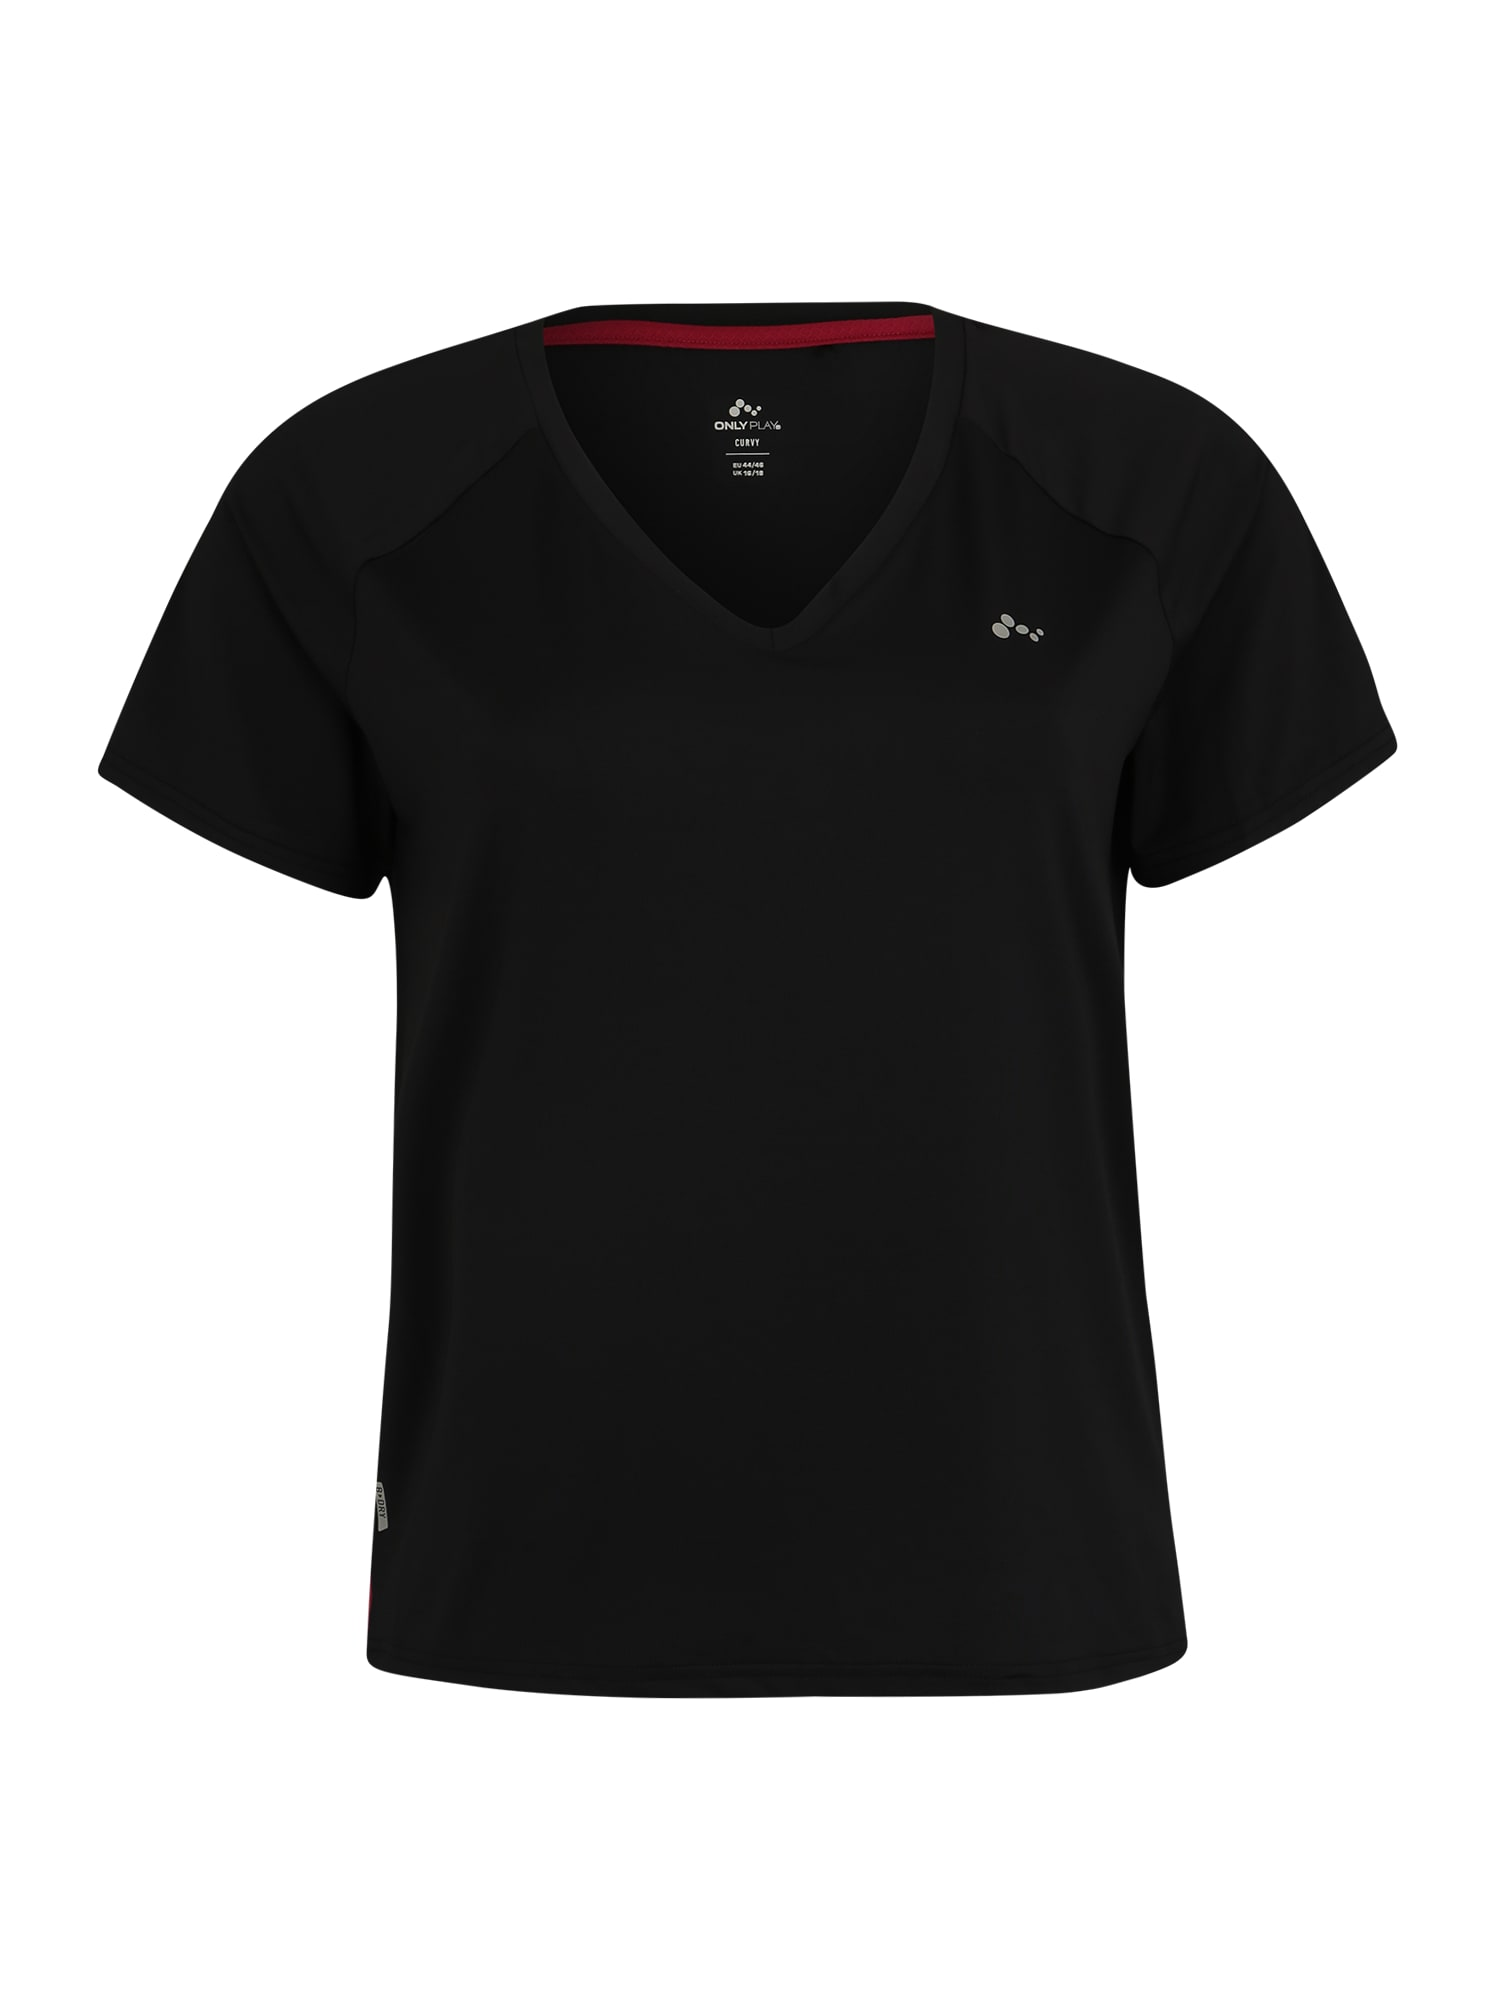 Sportshirt 'JODIE' | Sportbekleidung > Sportshirts > T-Shirts | Only Play Curvy